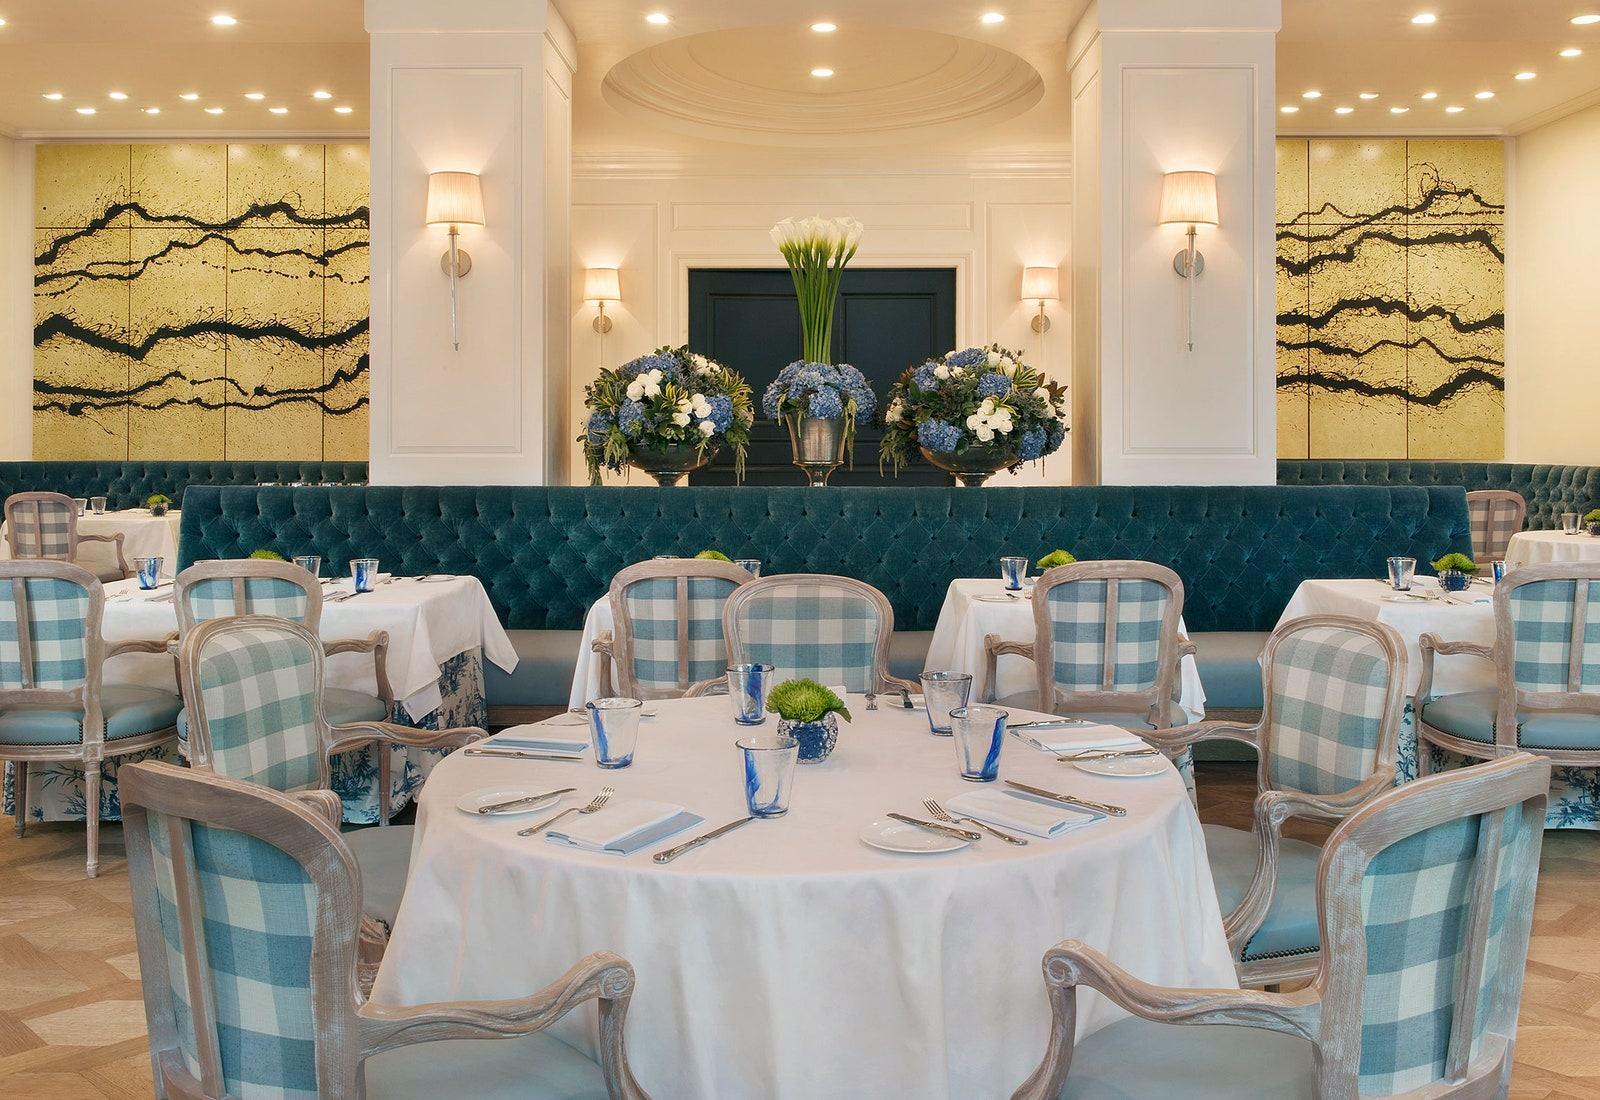 The World's Most Luxurious Brunch Restaurants   Architectural Digest